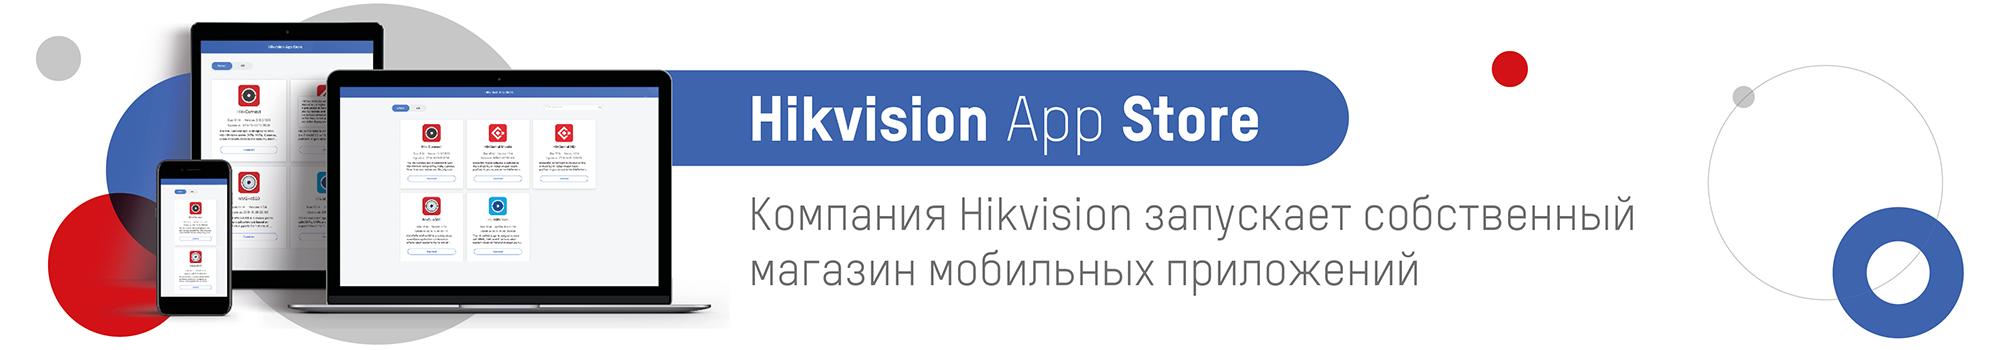 hikvisionappstore3